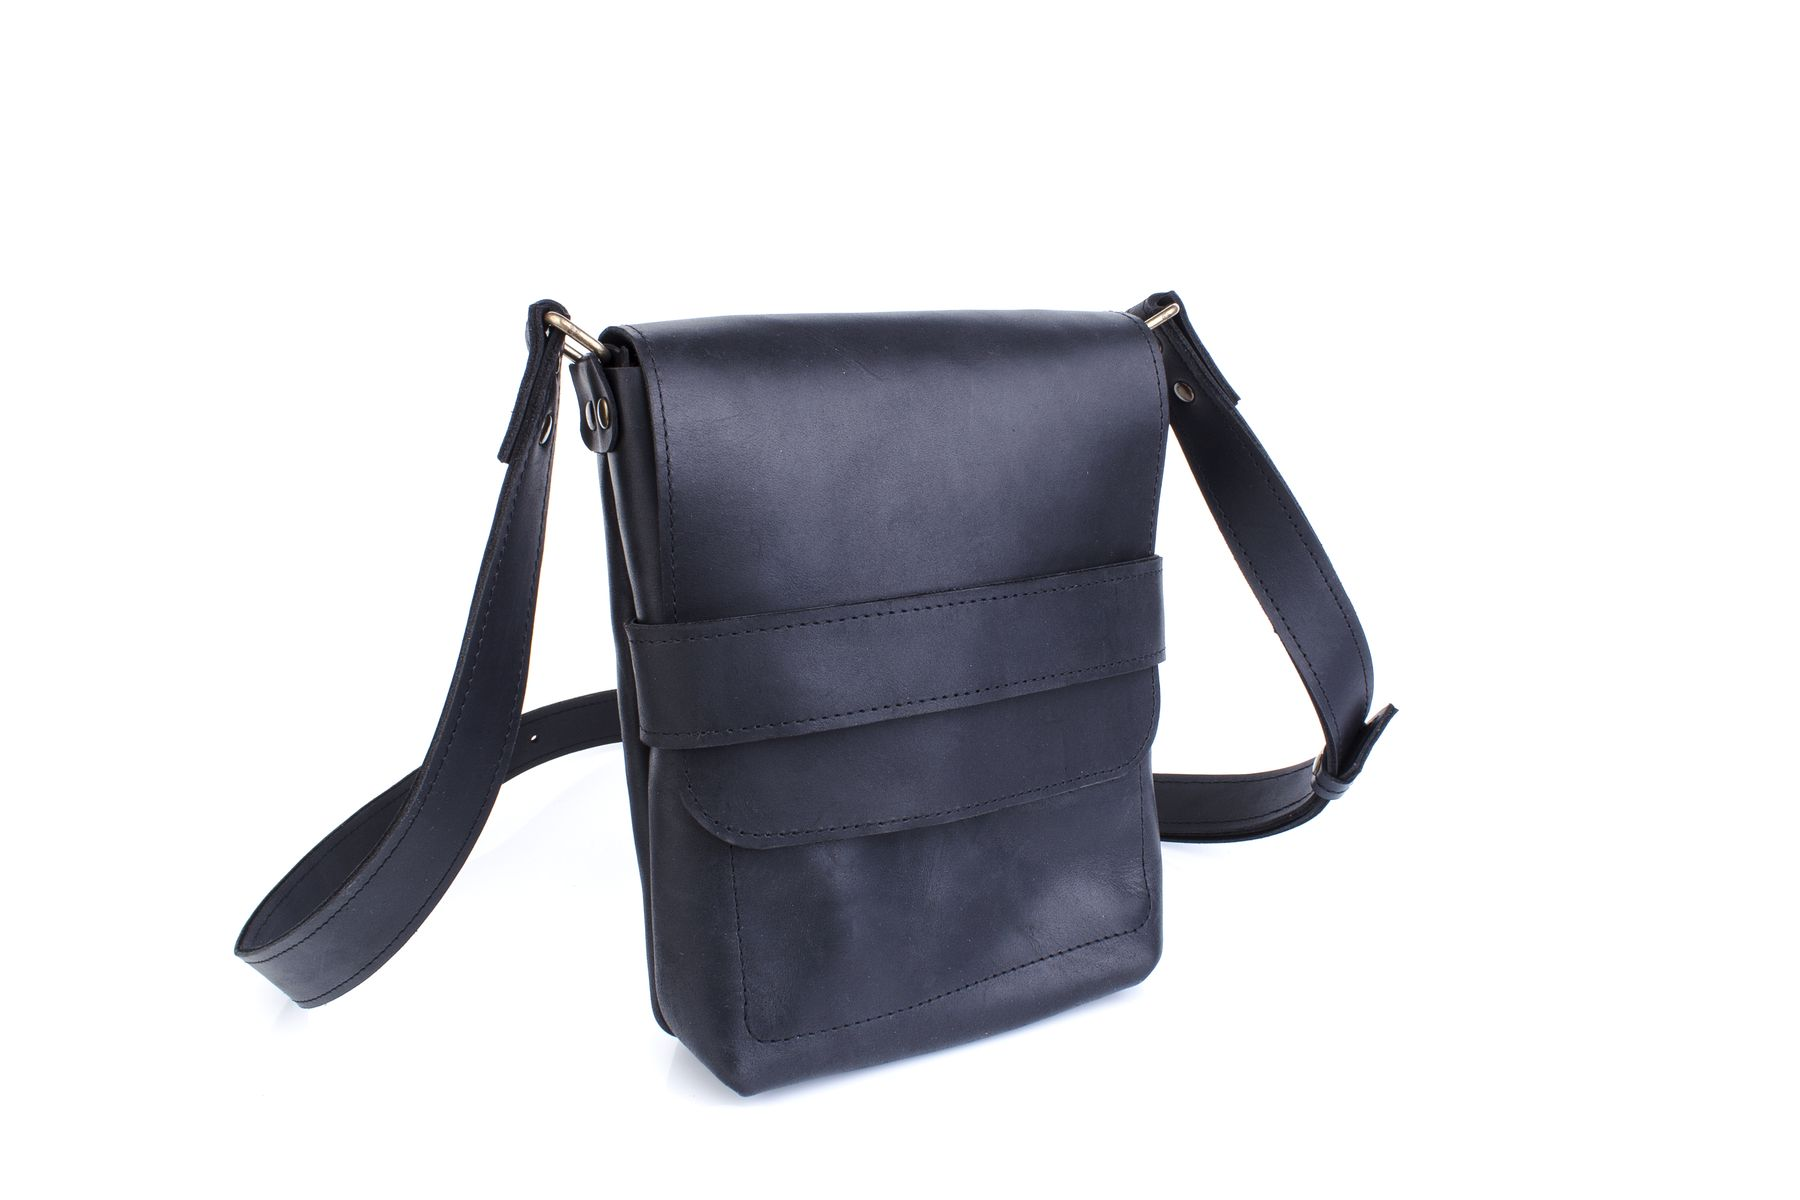 Black Leather Satchel